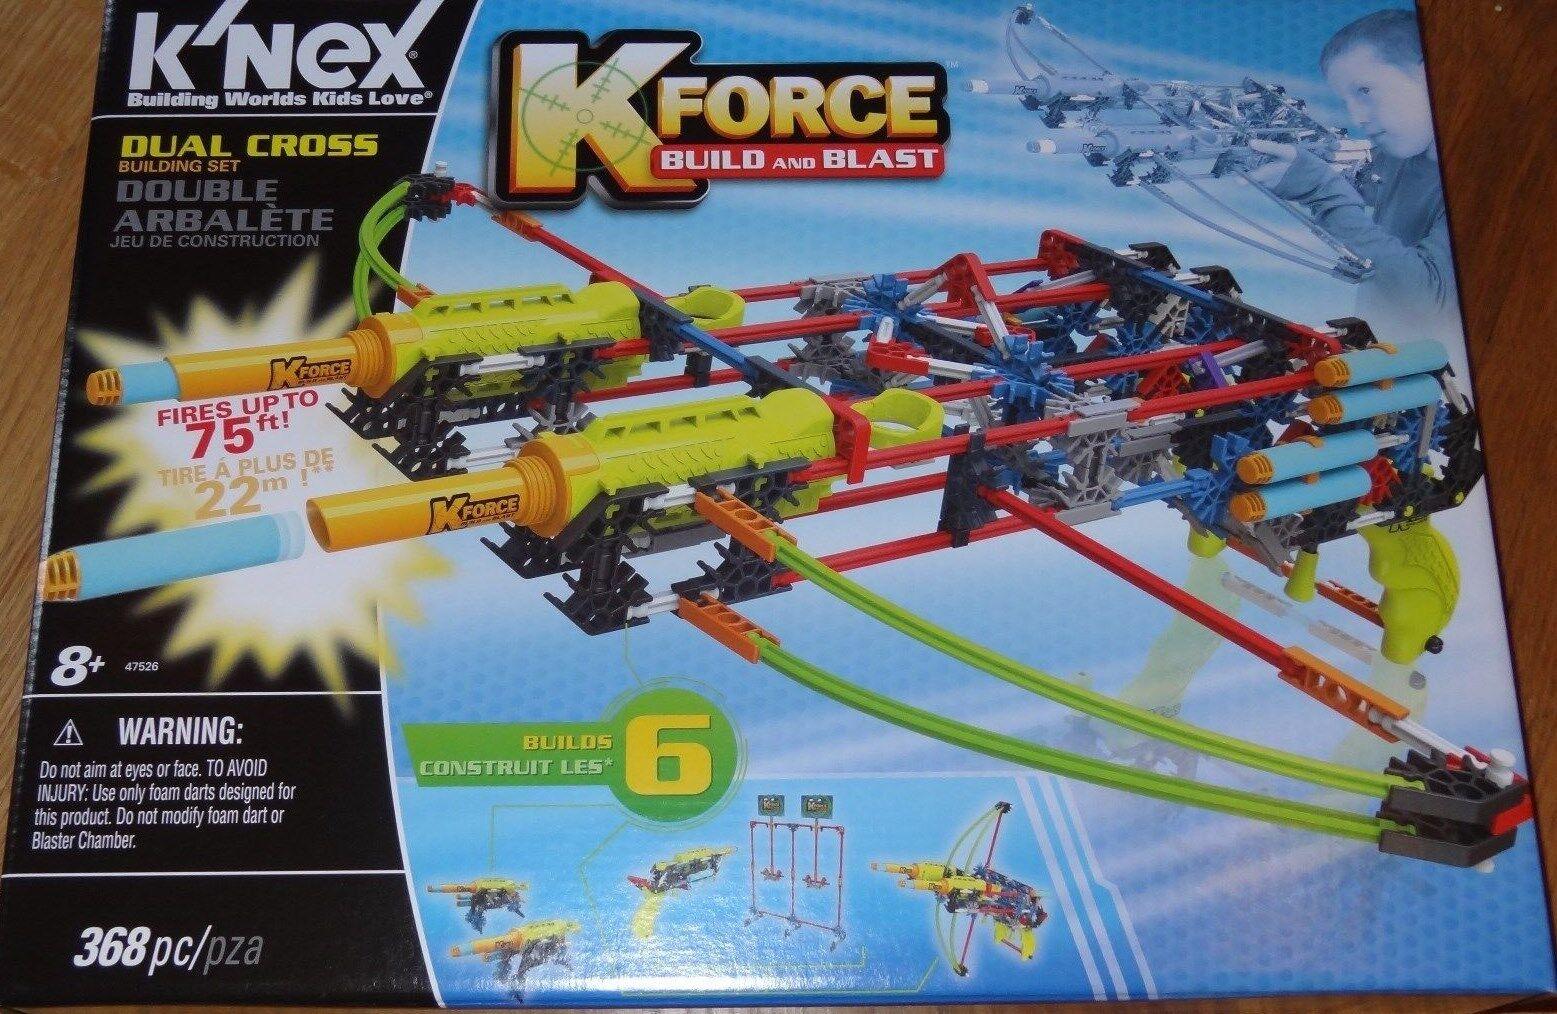 K'NEX Dual Cross K Force Building Set Construction Toy KNEX 47526